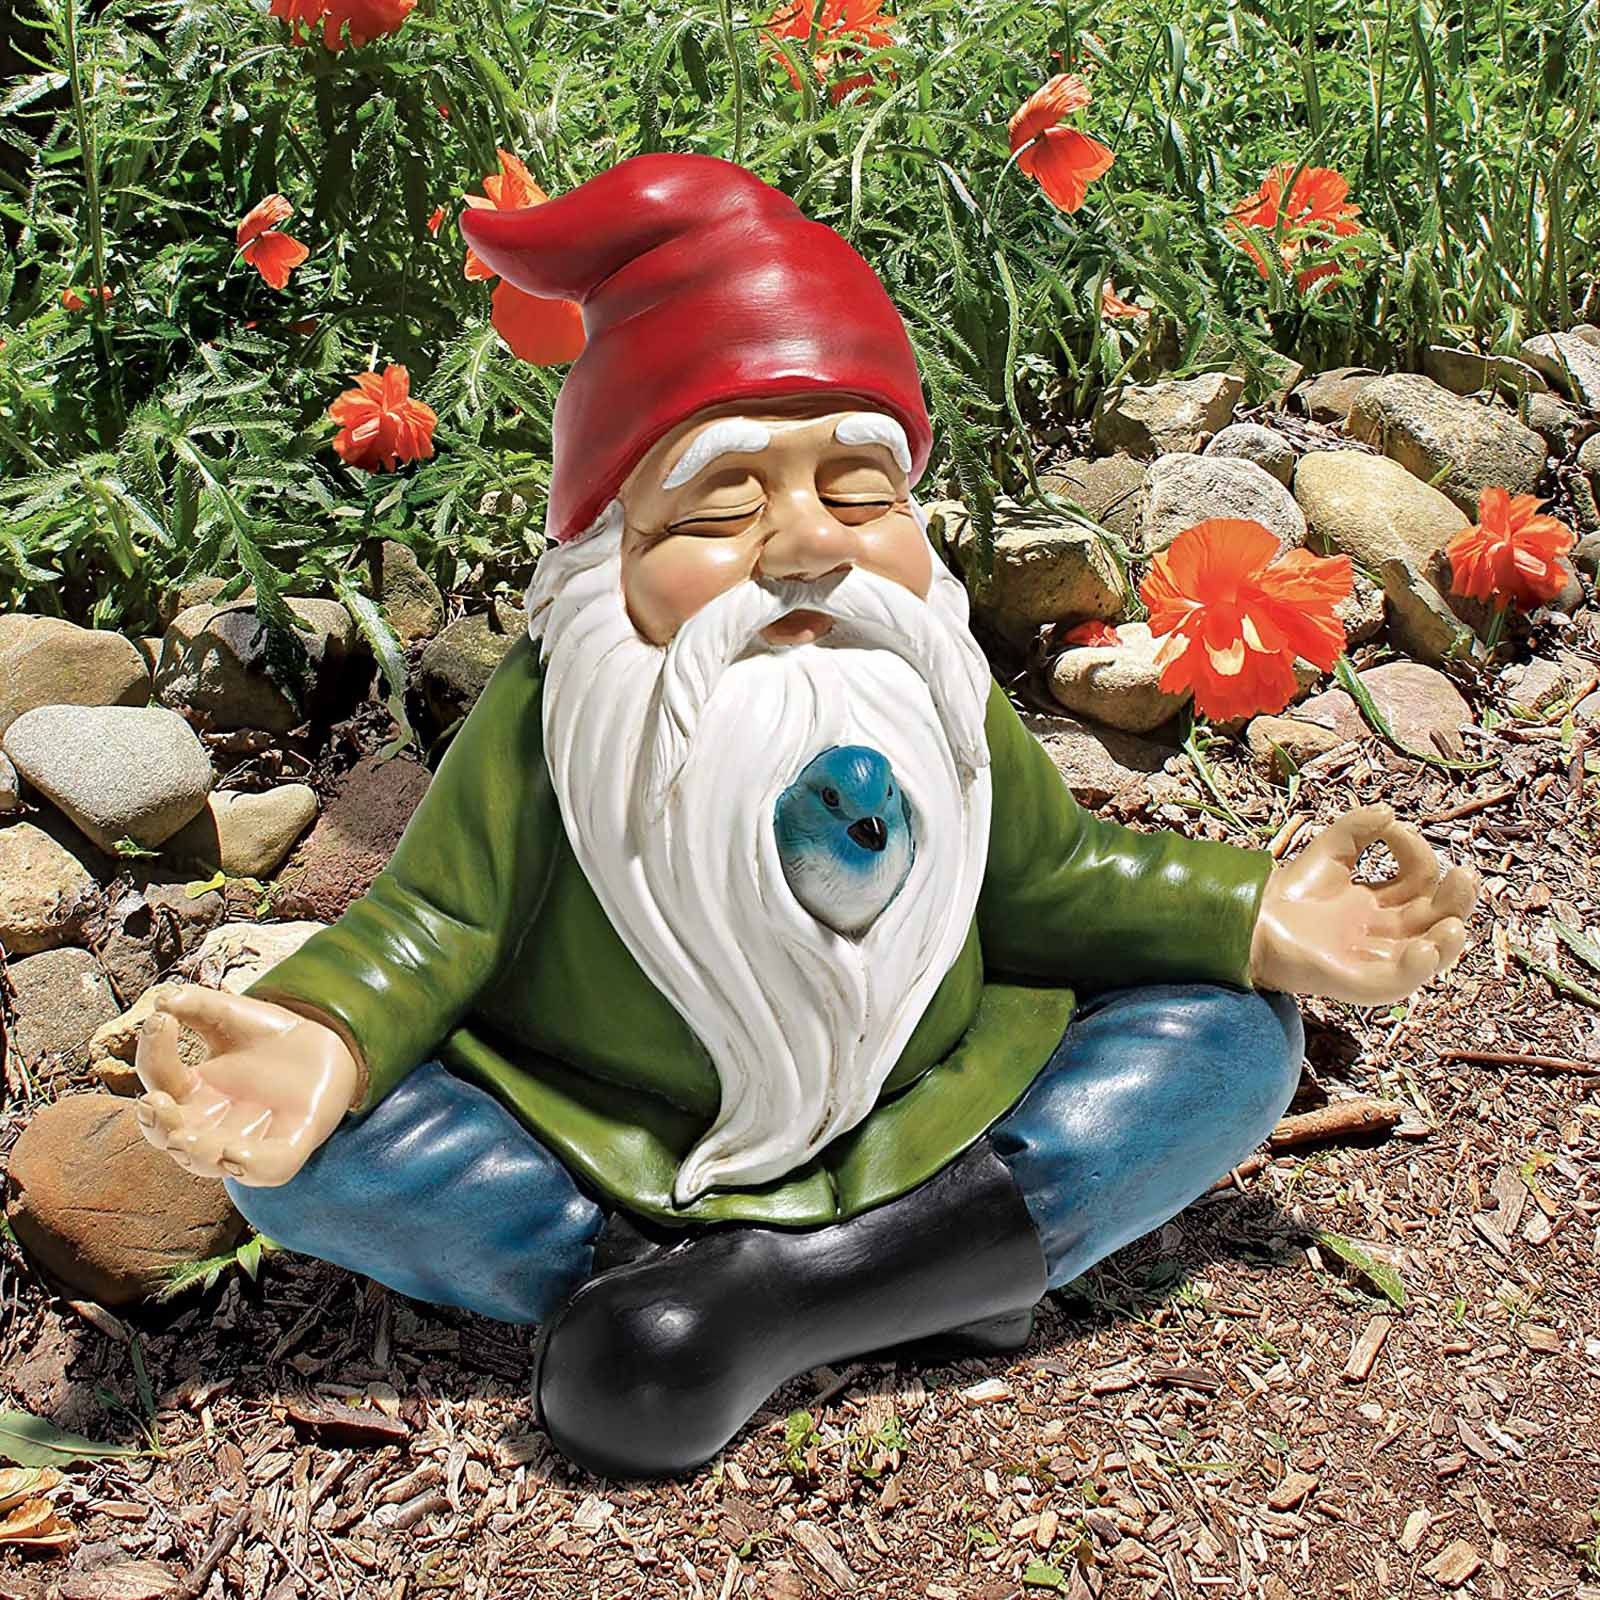 Garden Dwarf Statue-resin Dwarf Statue Full Color Zen Garden Gnome Statue Gnomes Ogród Садовые Фигуры Большие Figurines#g3